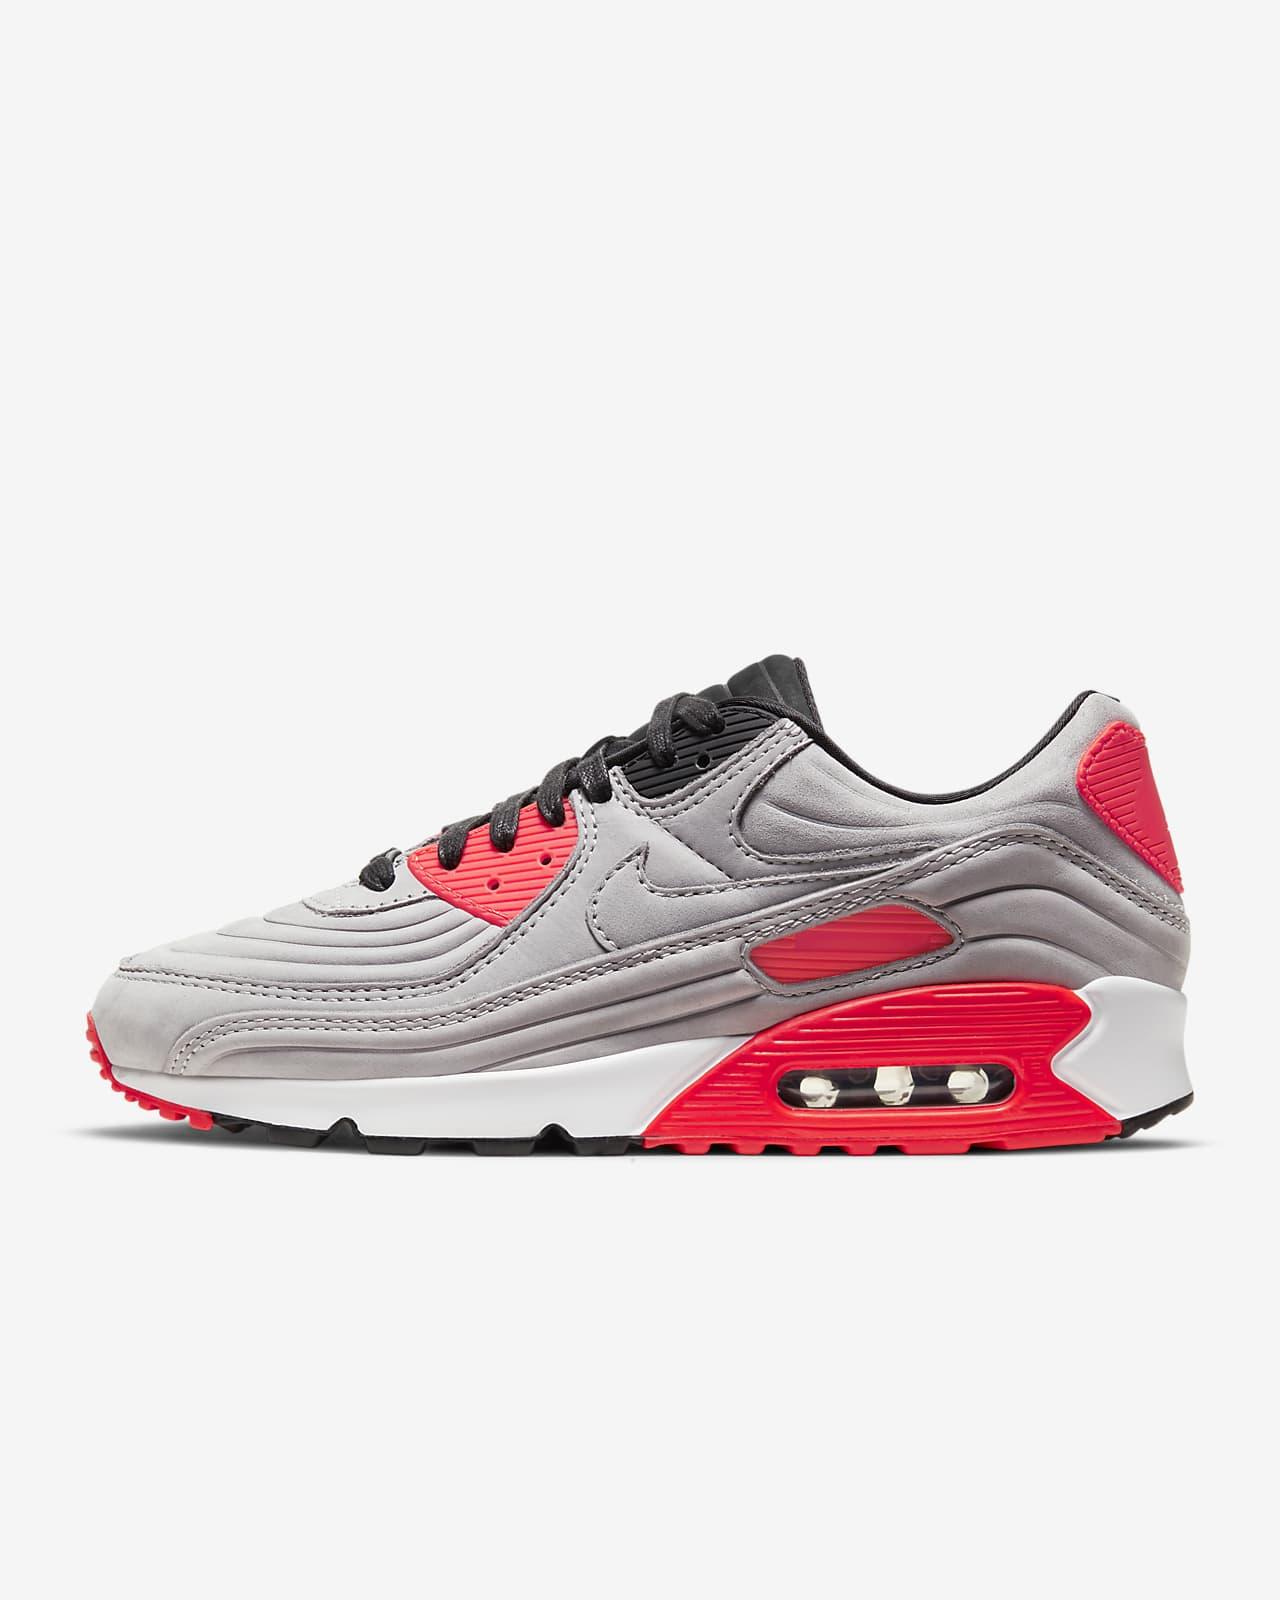 Nike Air Max 90 QS Men's Shoe